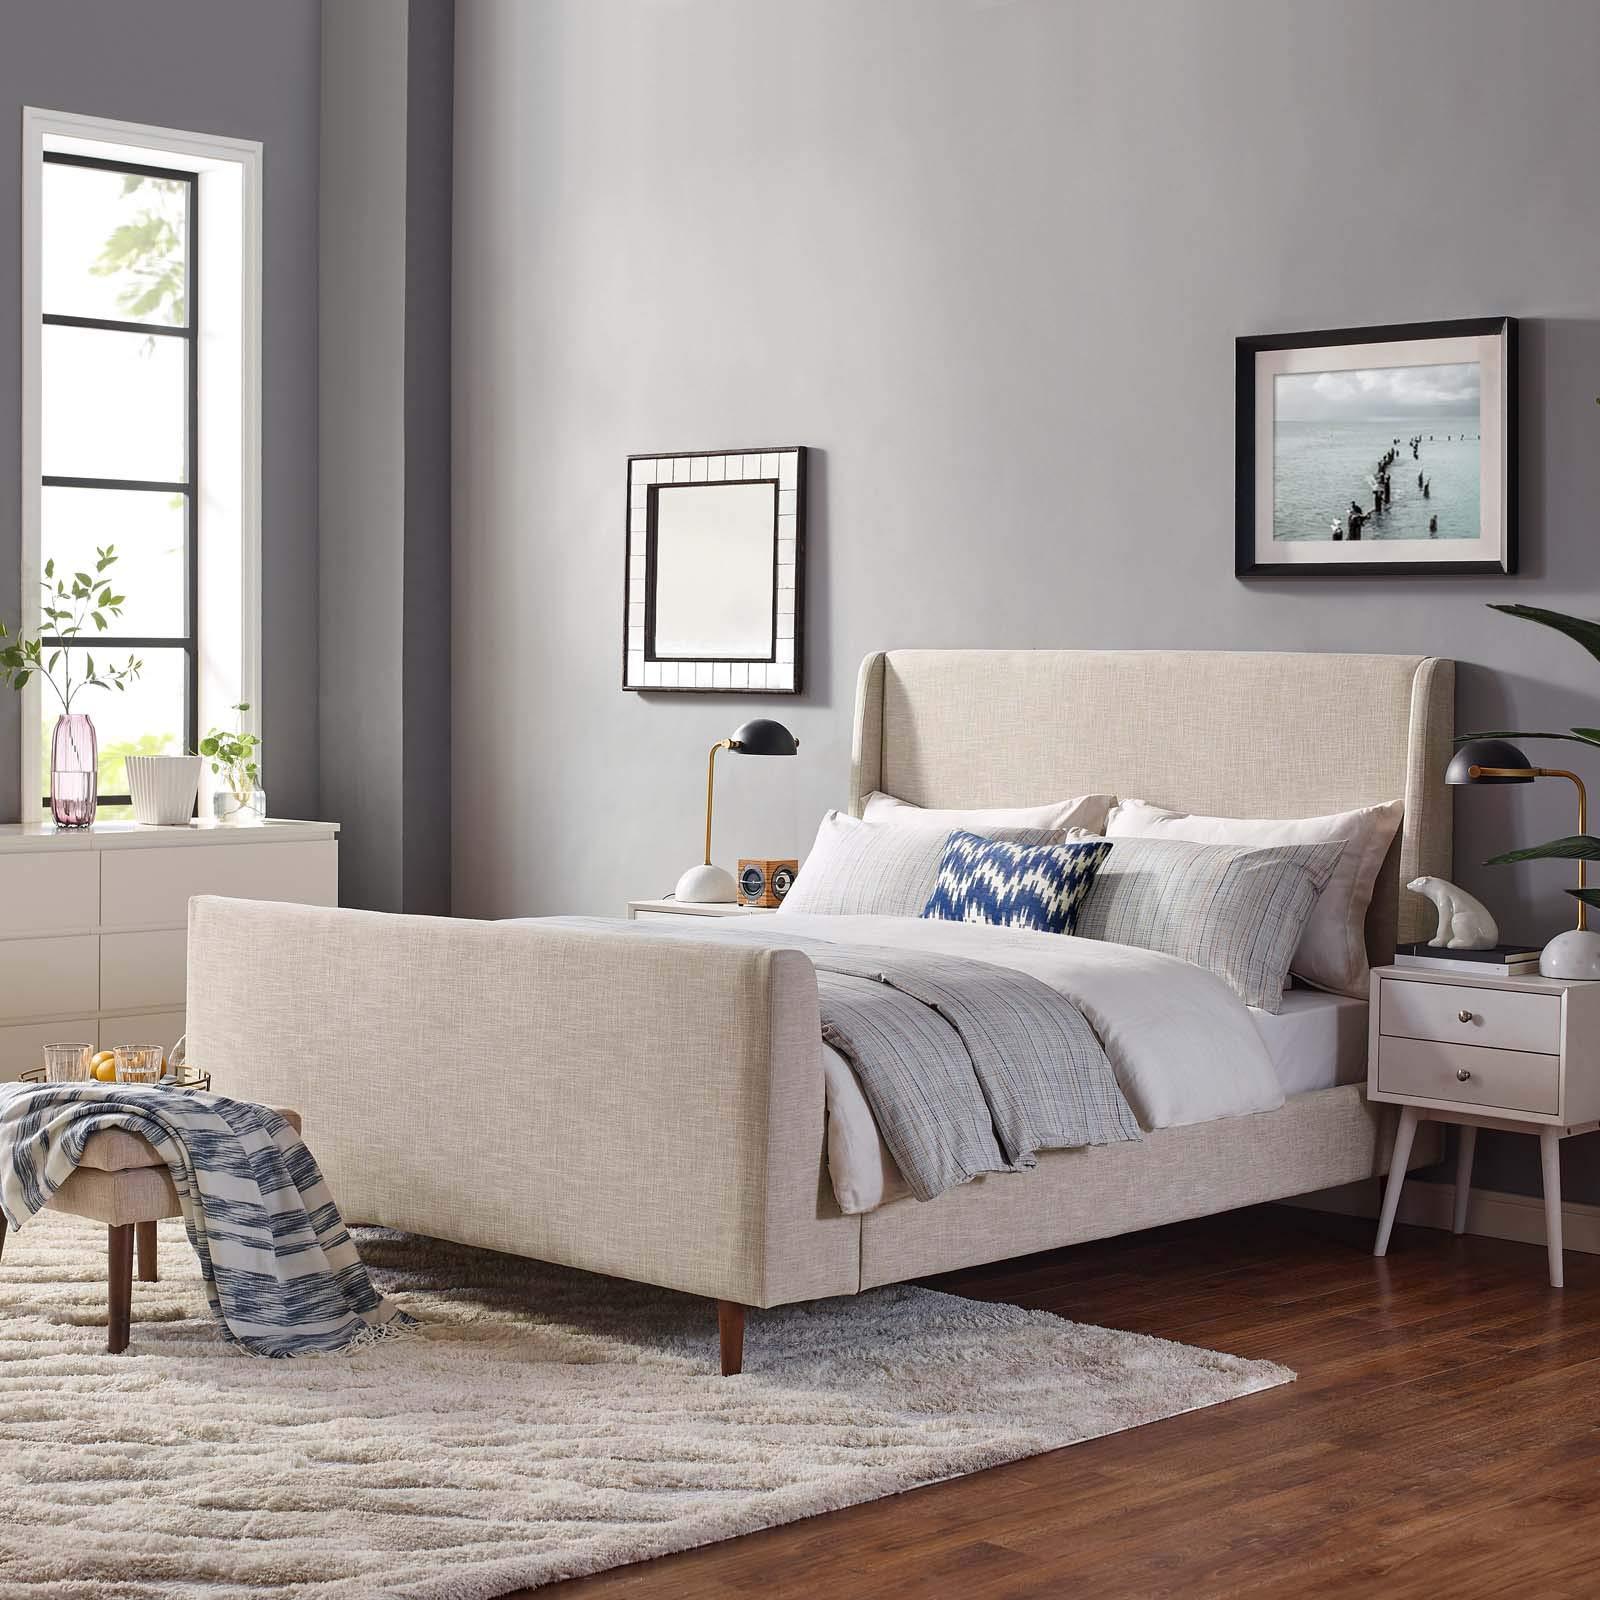 Modway MOD-5824-BEI Aubree Queen Upholstered Fabric Sleigh Platform Bed, Beige